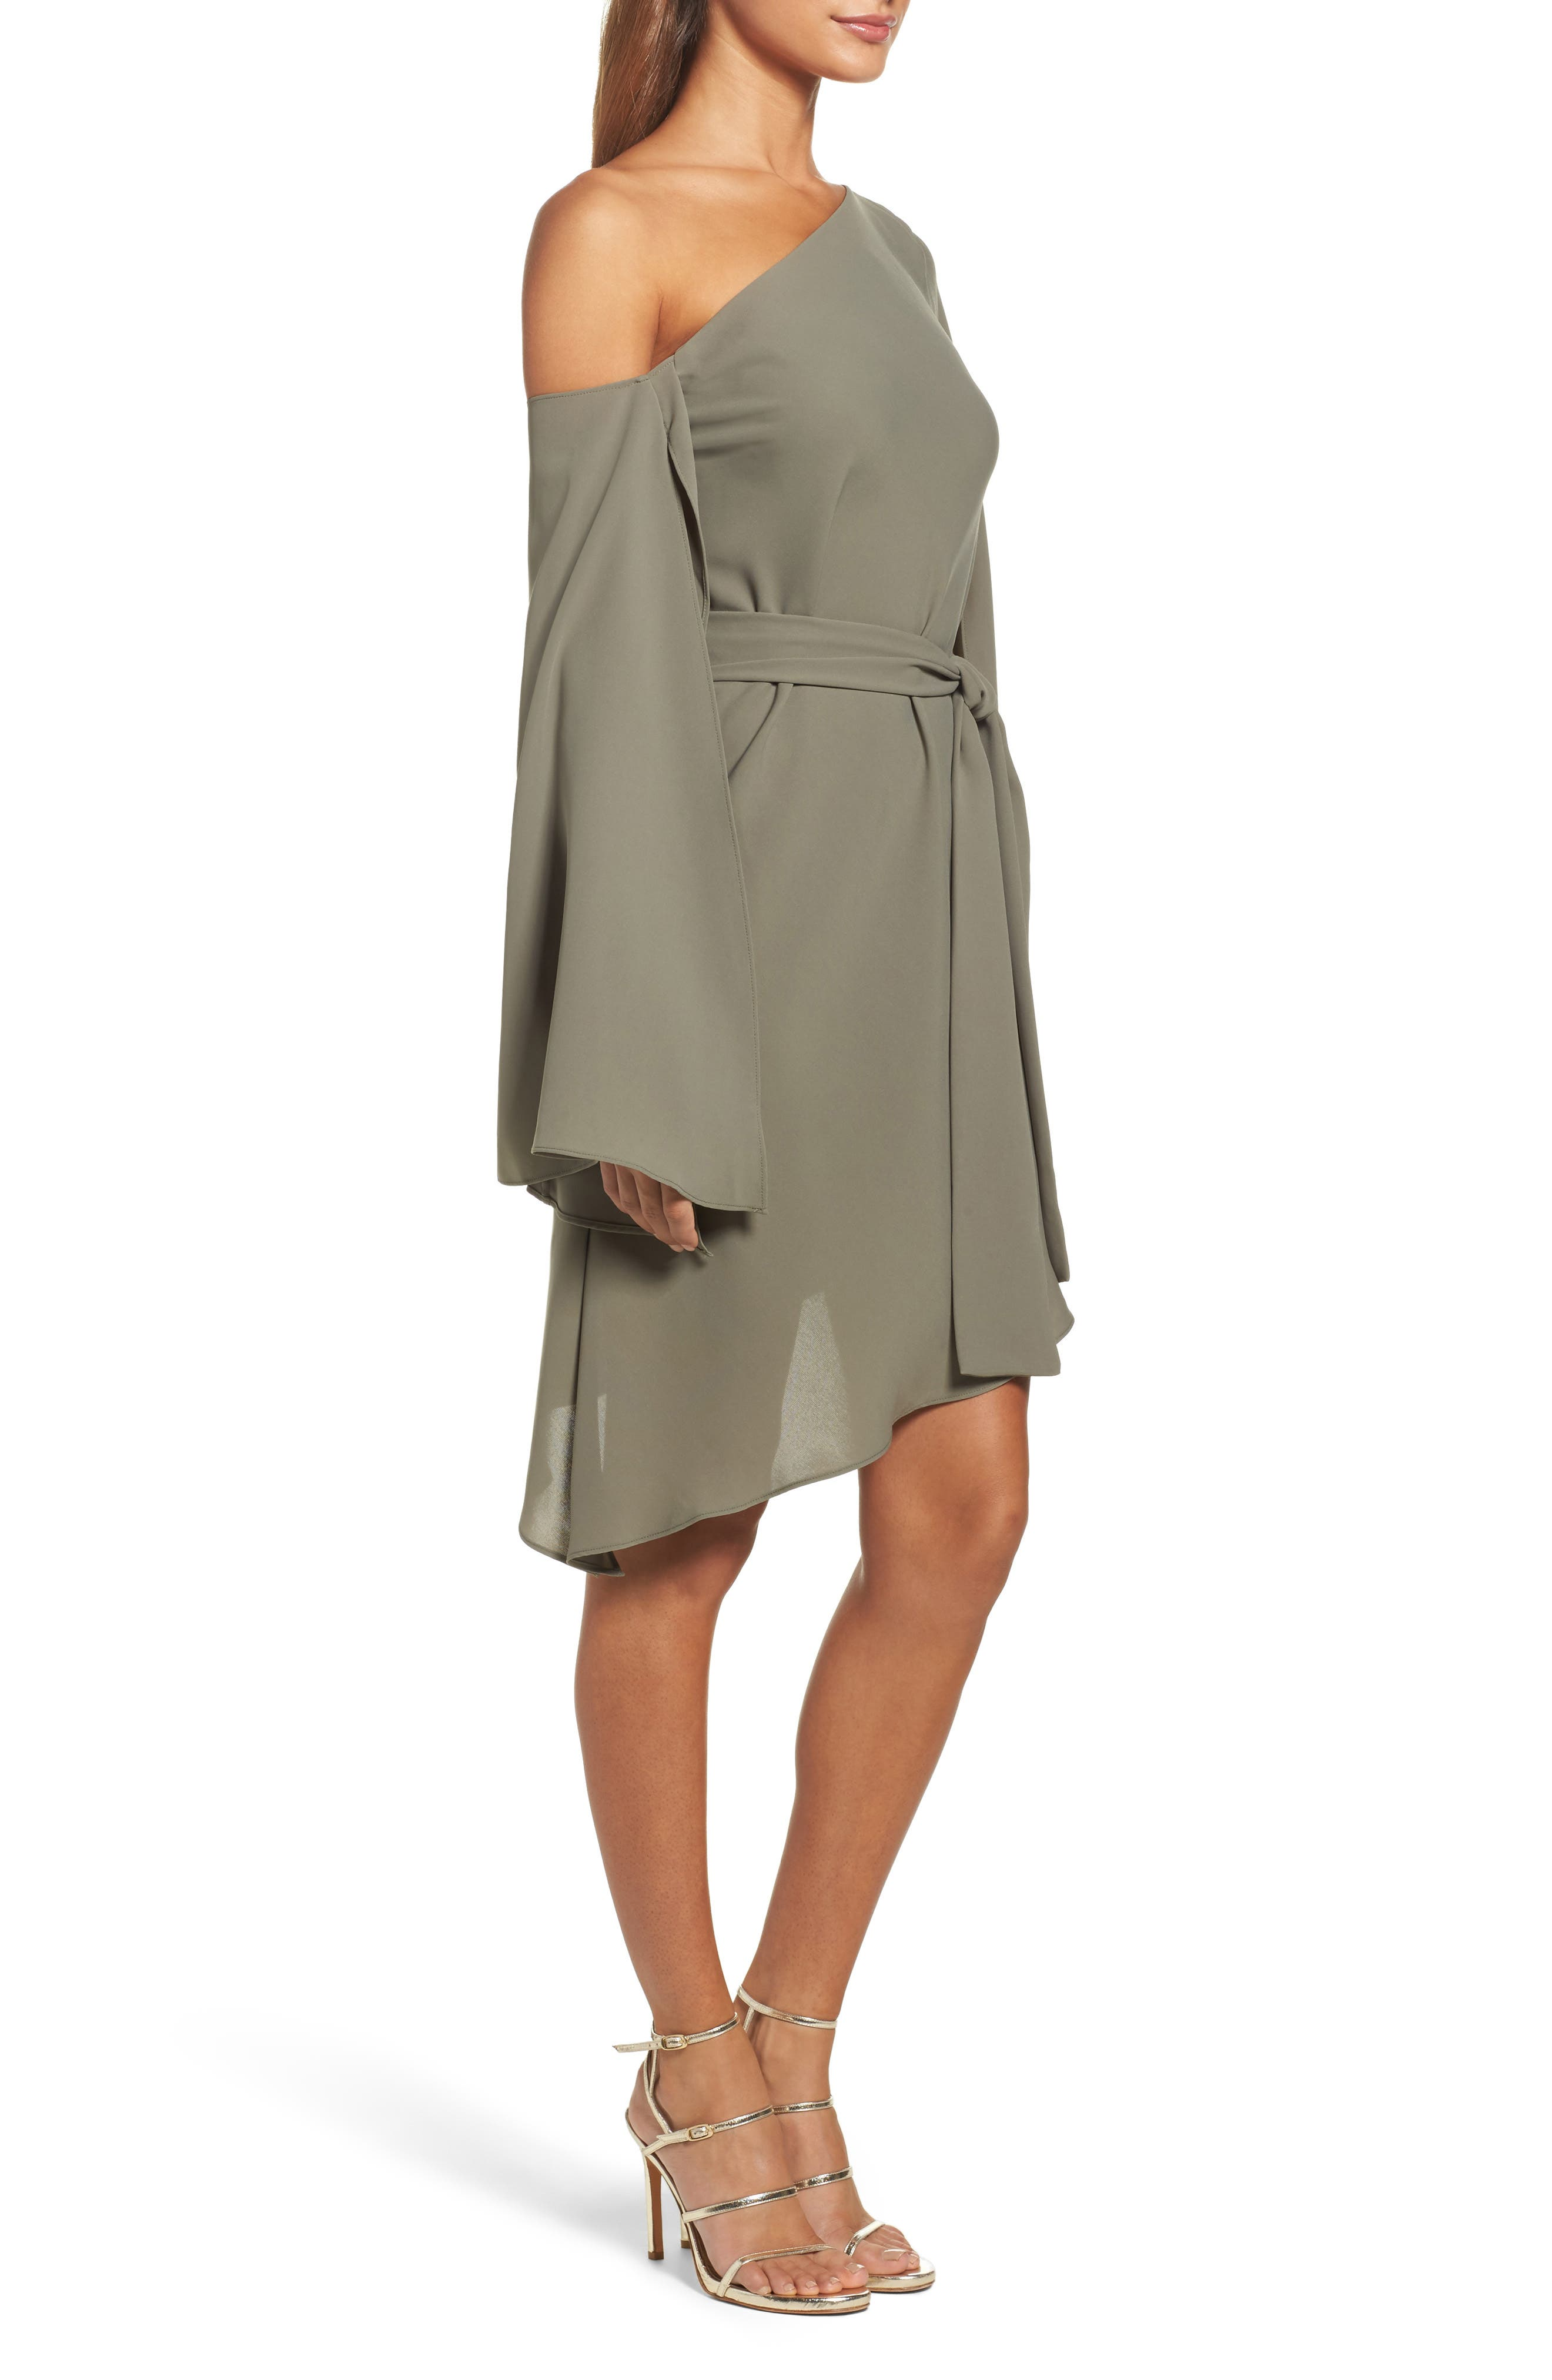 Beyond Me One-Shoulder Dress,                             Alternate thumbnail 4, color,                             Khaki